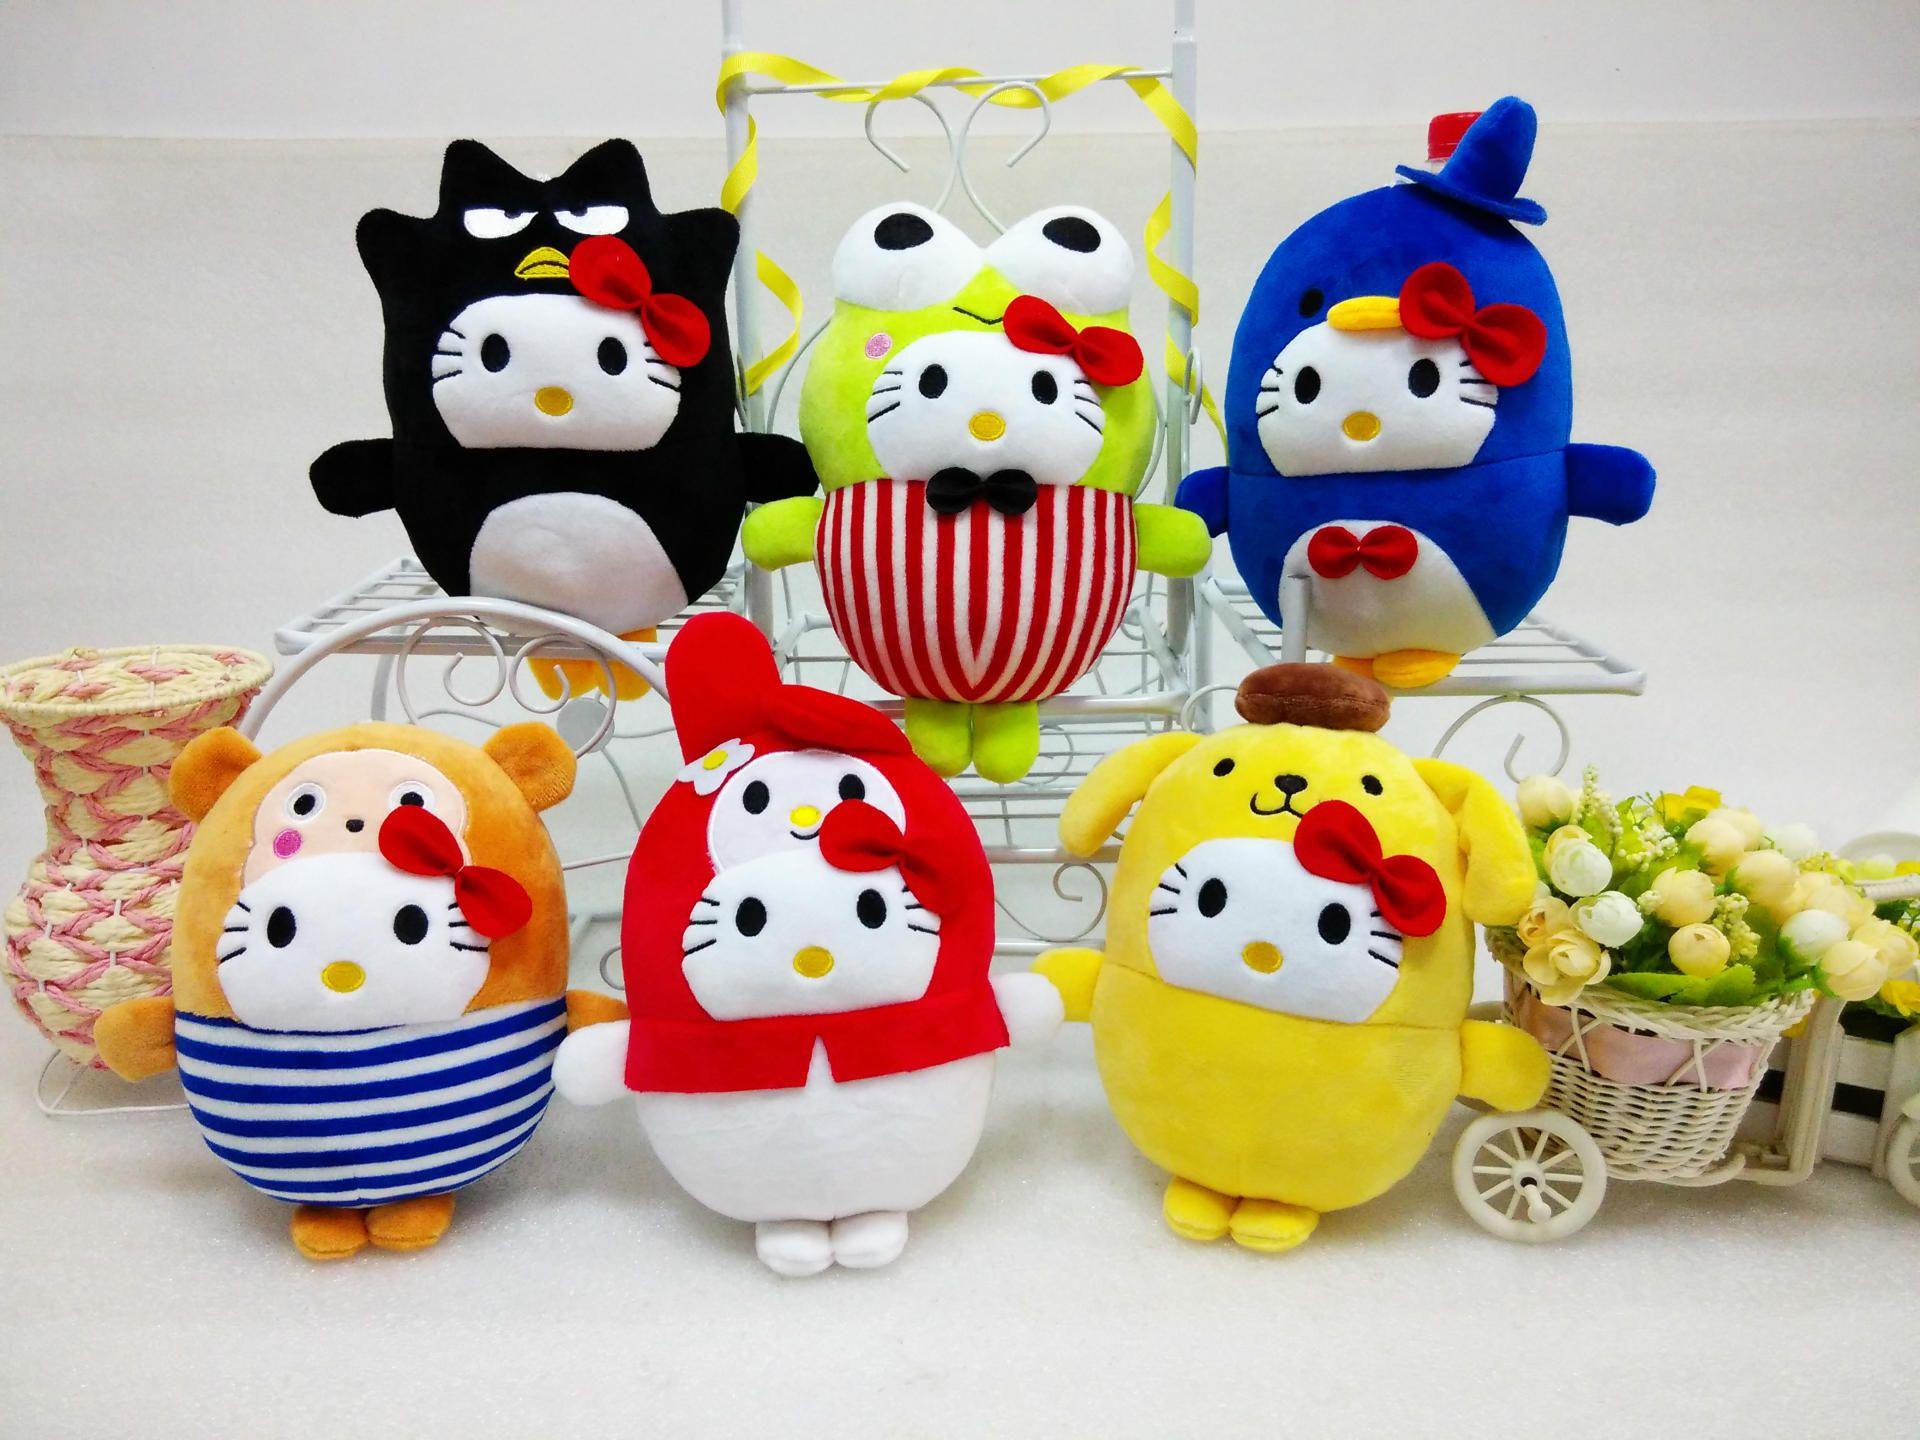 Hello Kitty Plush Toys : Happy birthday hello kitty lots of new stuff to celebrate u japanla